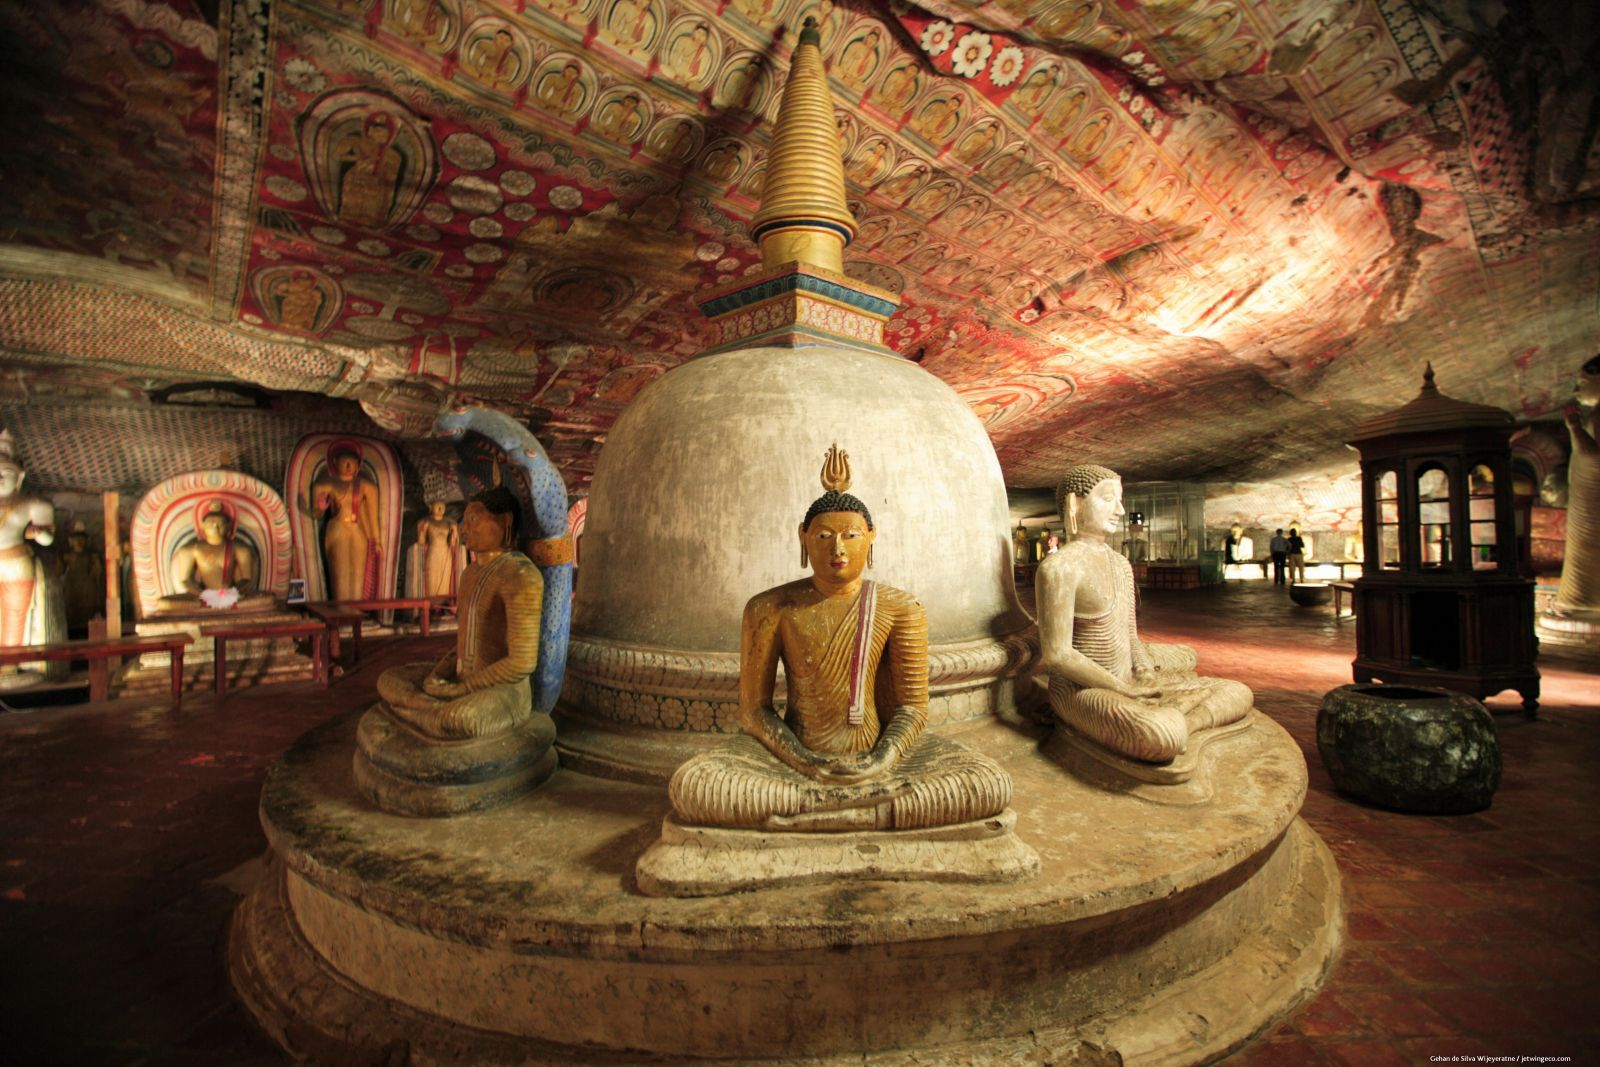 dambulla cave temple | Dambulla Cave Temple, Sri Lanka